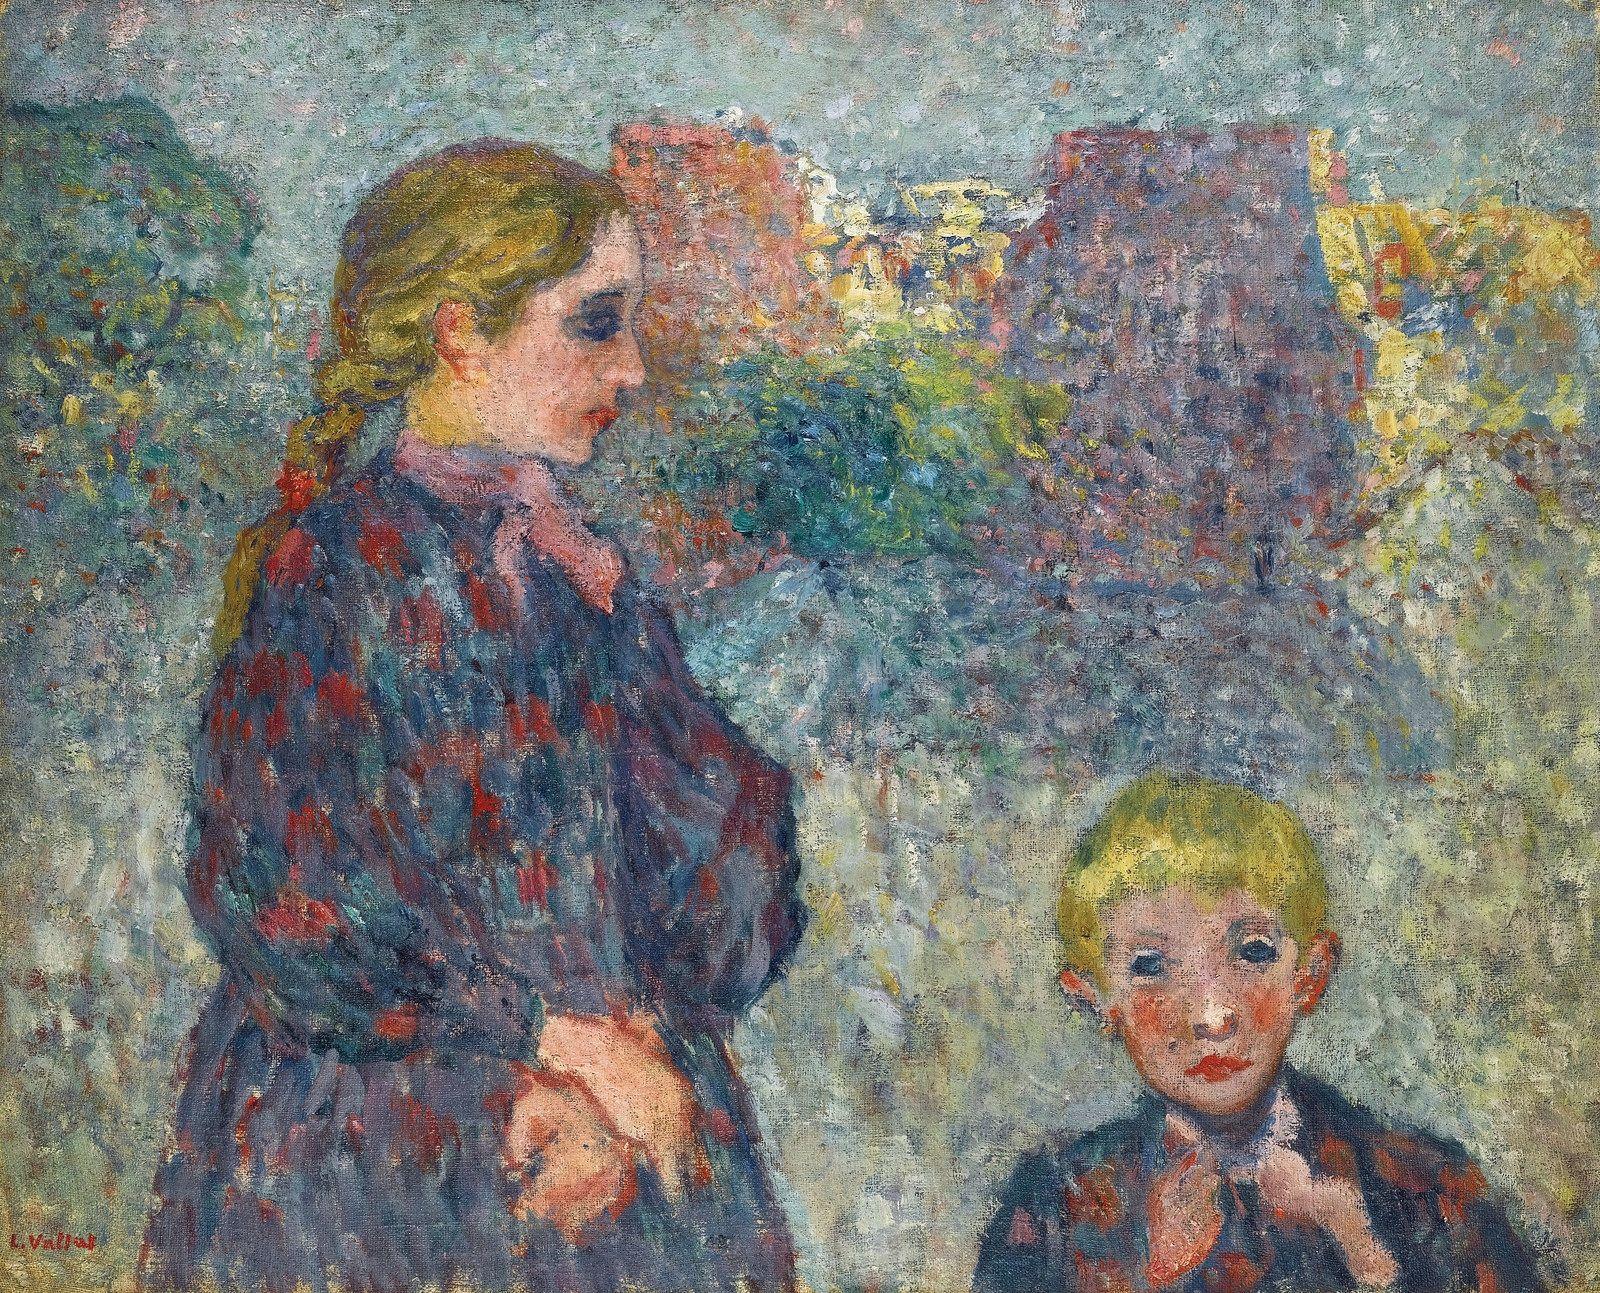 Two Children on the Beach, 1895. Louis Valtat